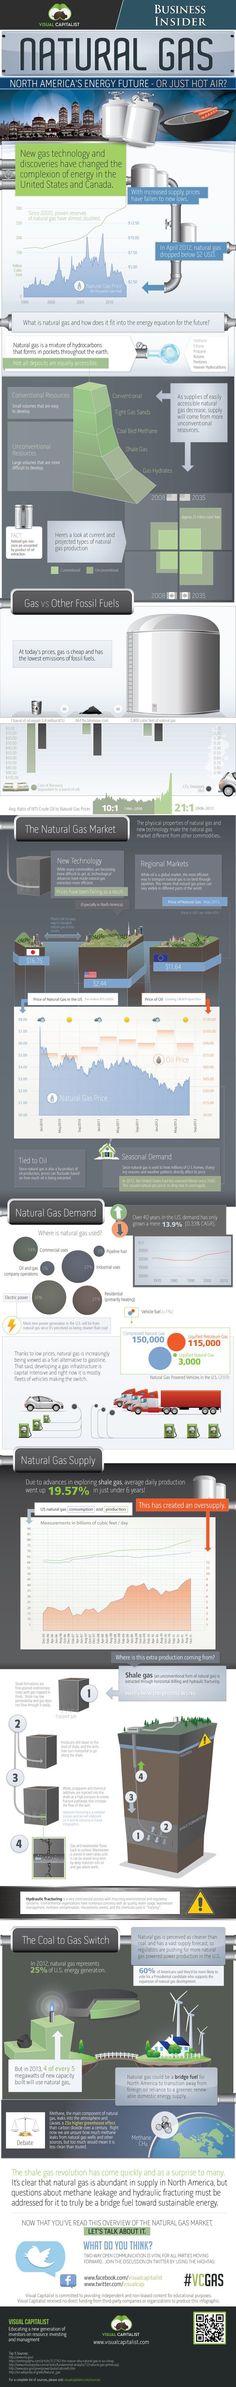 #NaturalGas info graphic  #alxcltd #energy #uk #oil #gas #oilandgas #NatGas